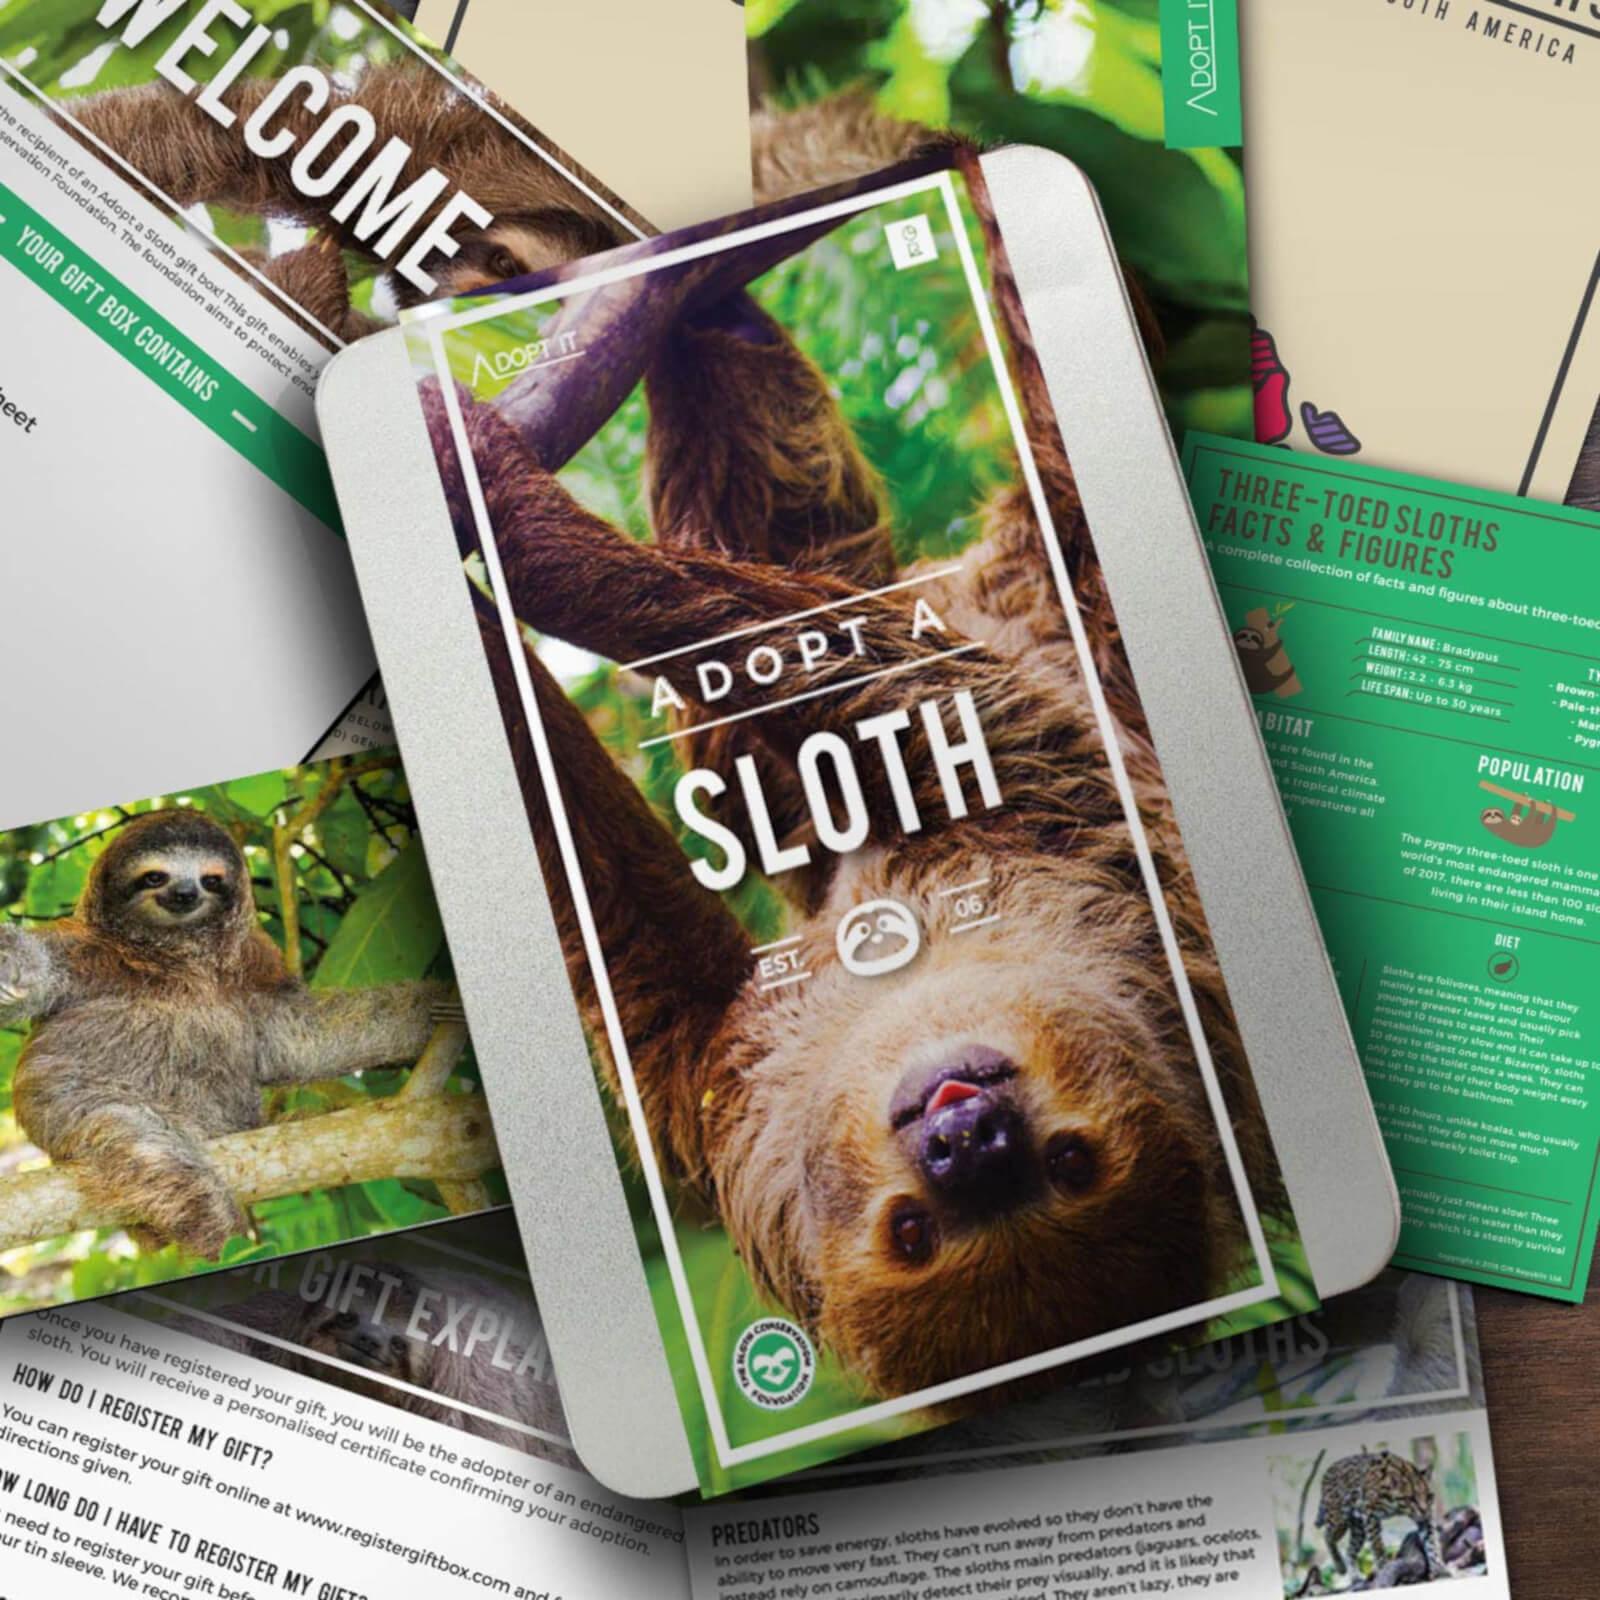 Image of Adopt a Sloth